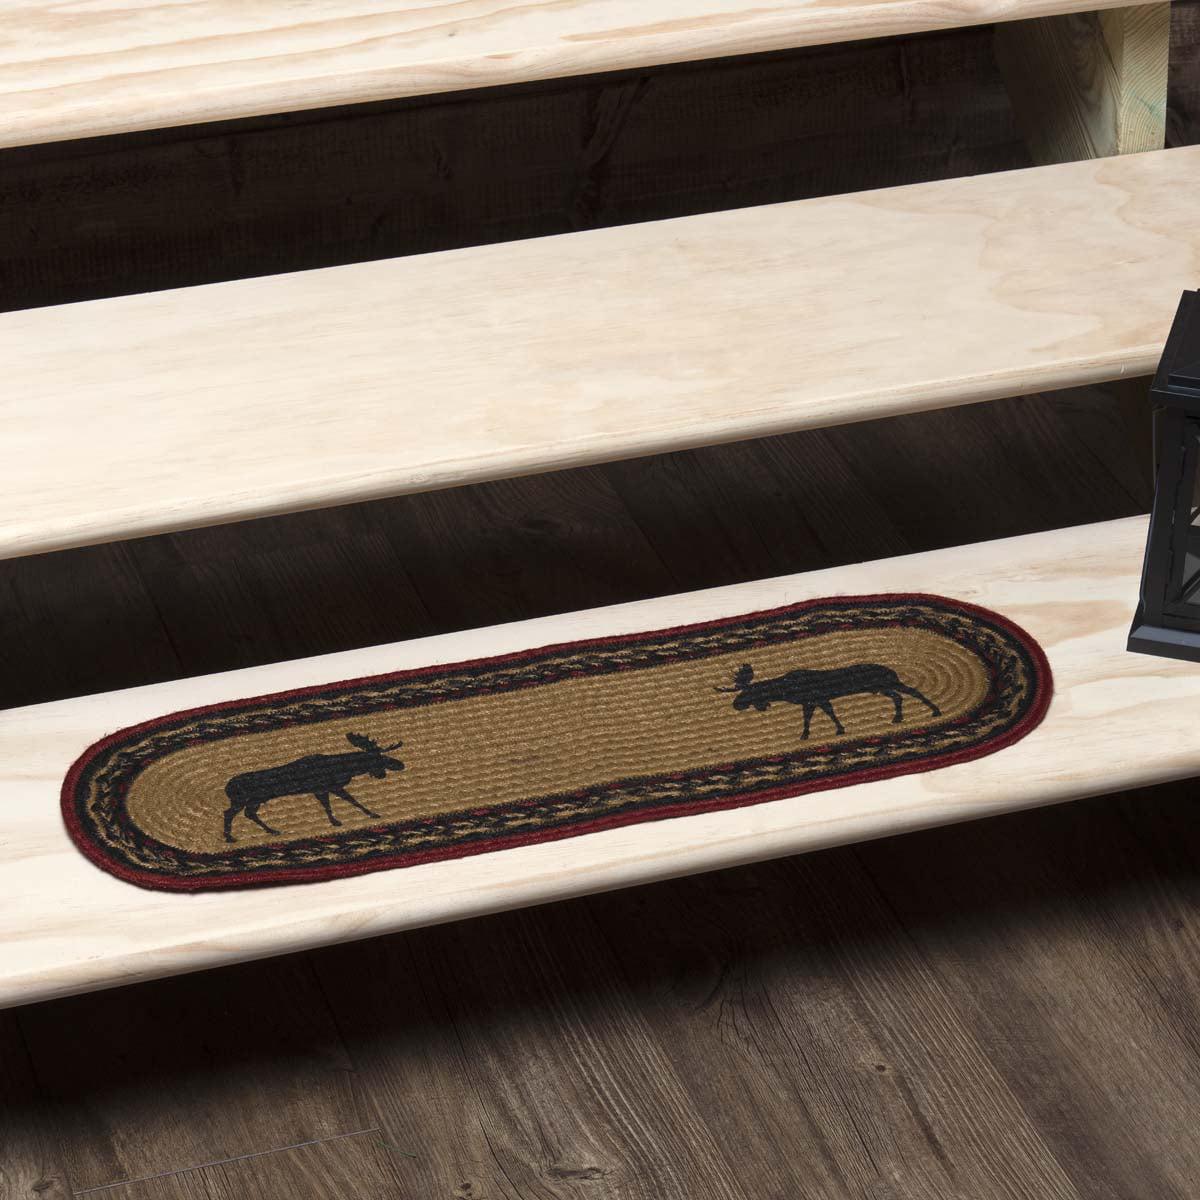 Almond Tan Rustic & Lodge Flooring Shasta Cabin Moose Jute Latex Backing Stenciled Nature Print Oval Stair Tread